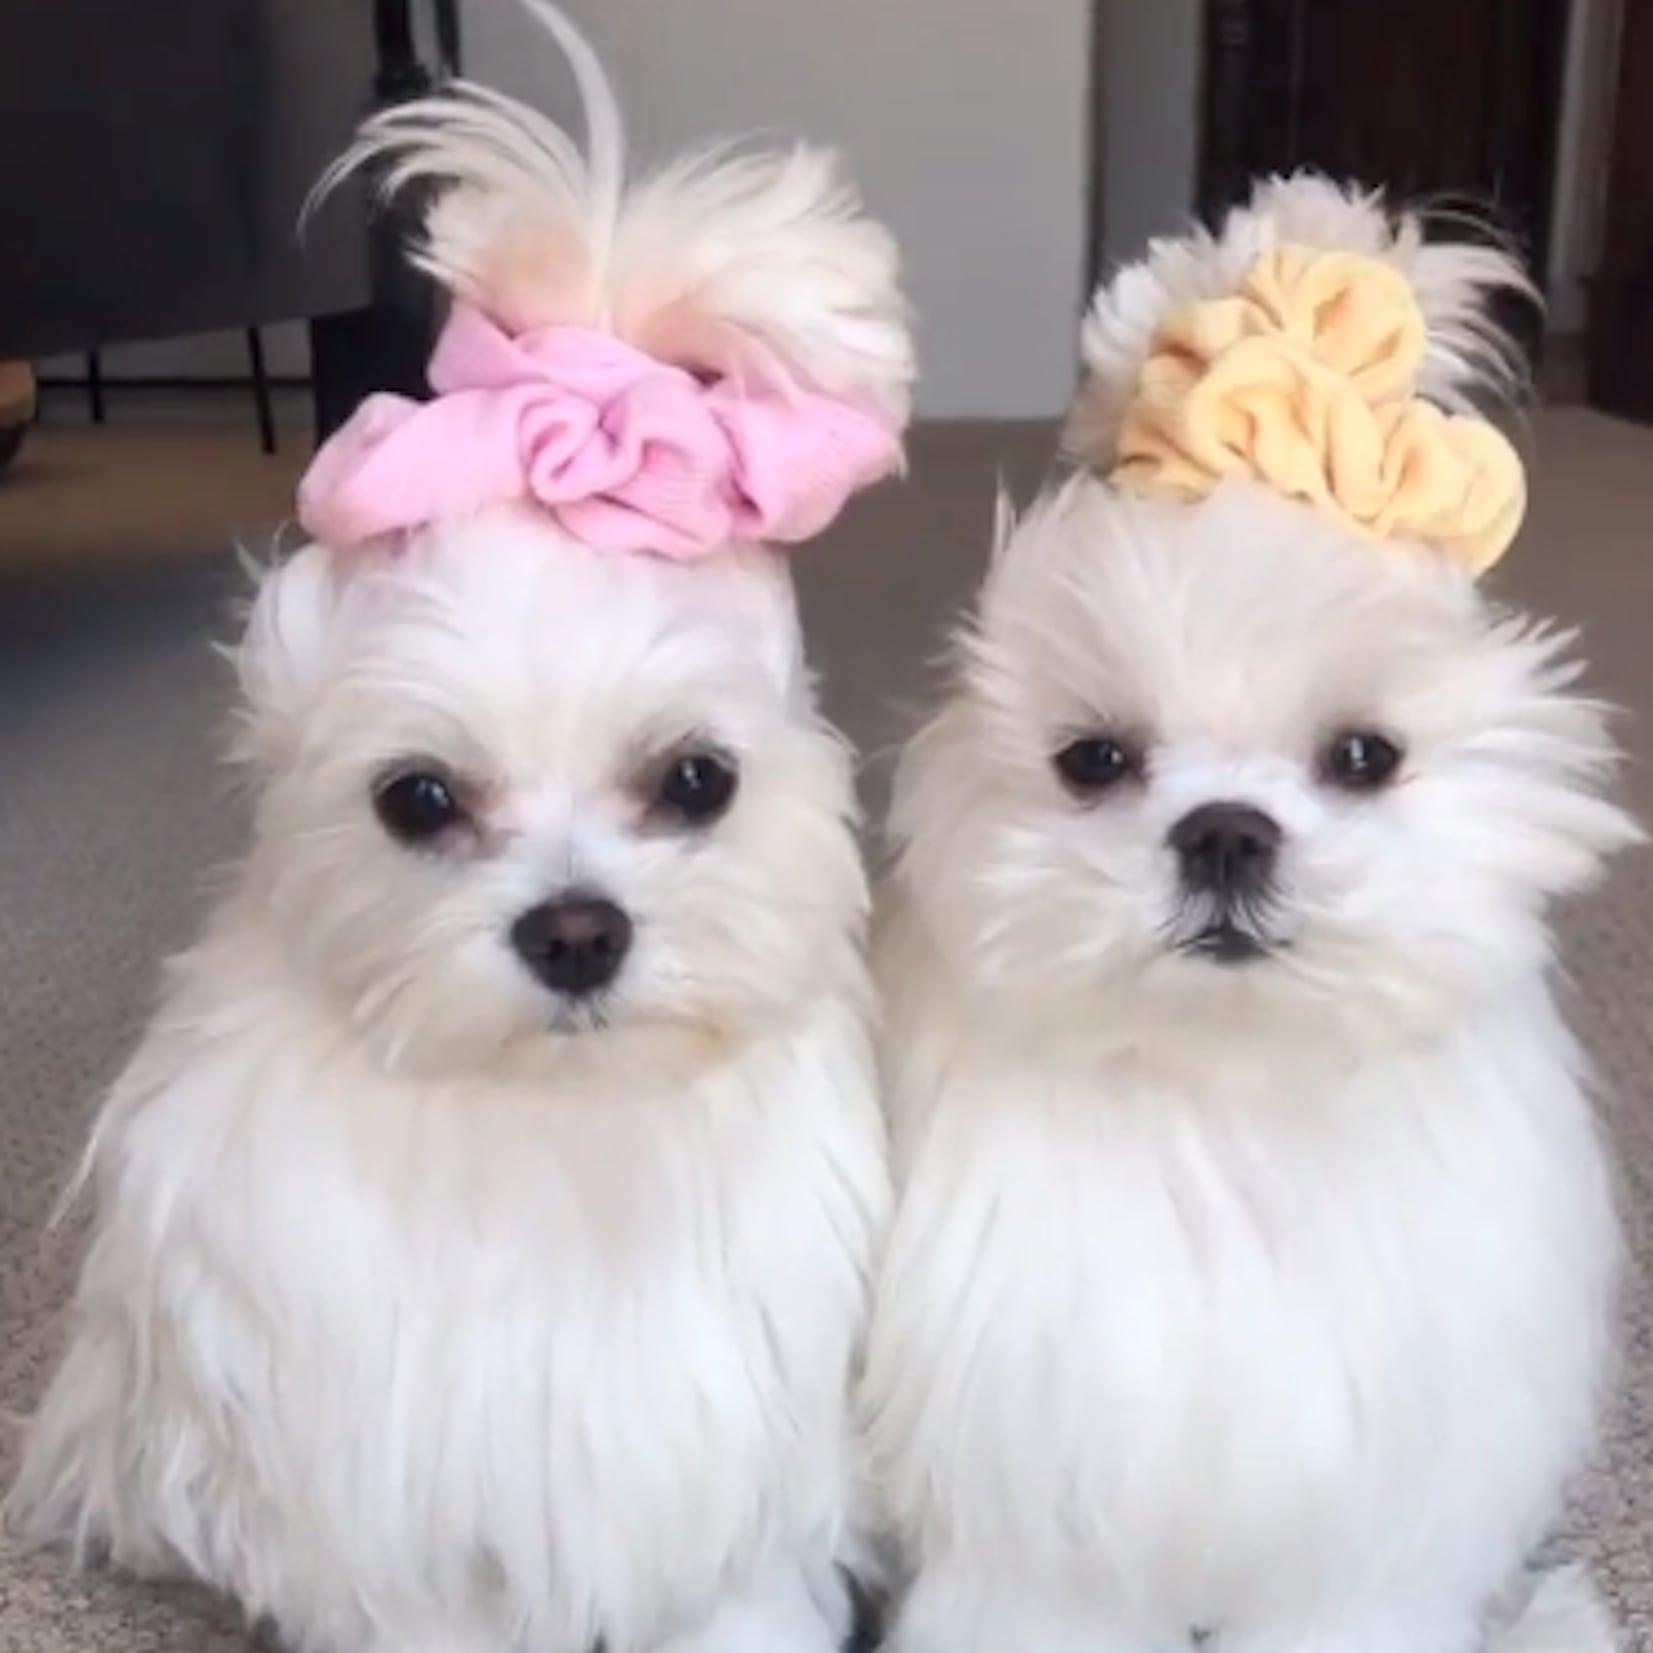 Funny Pet Videos On Tiktok Popsugar Pets